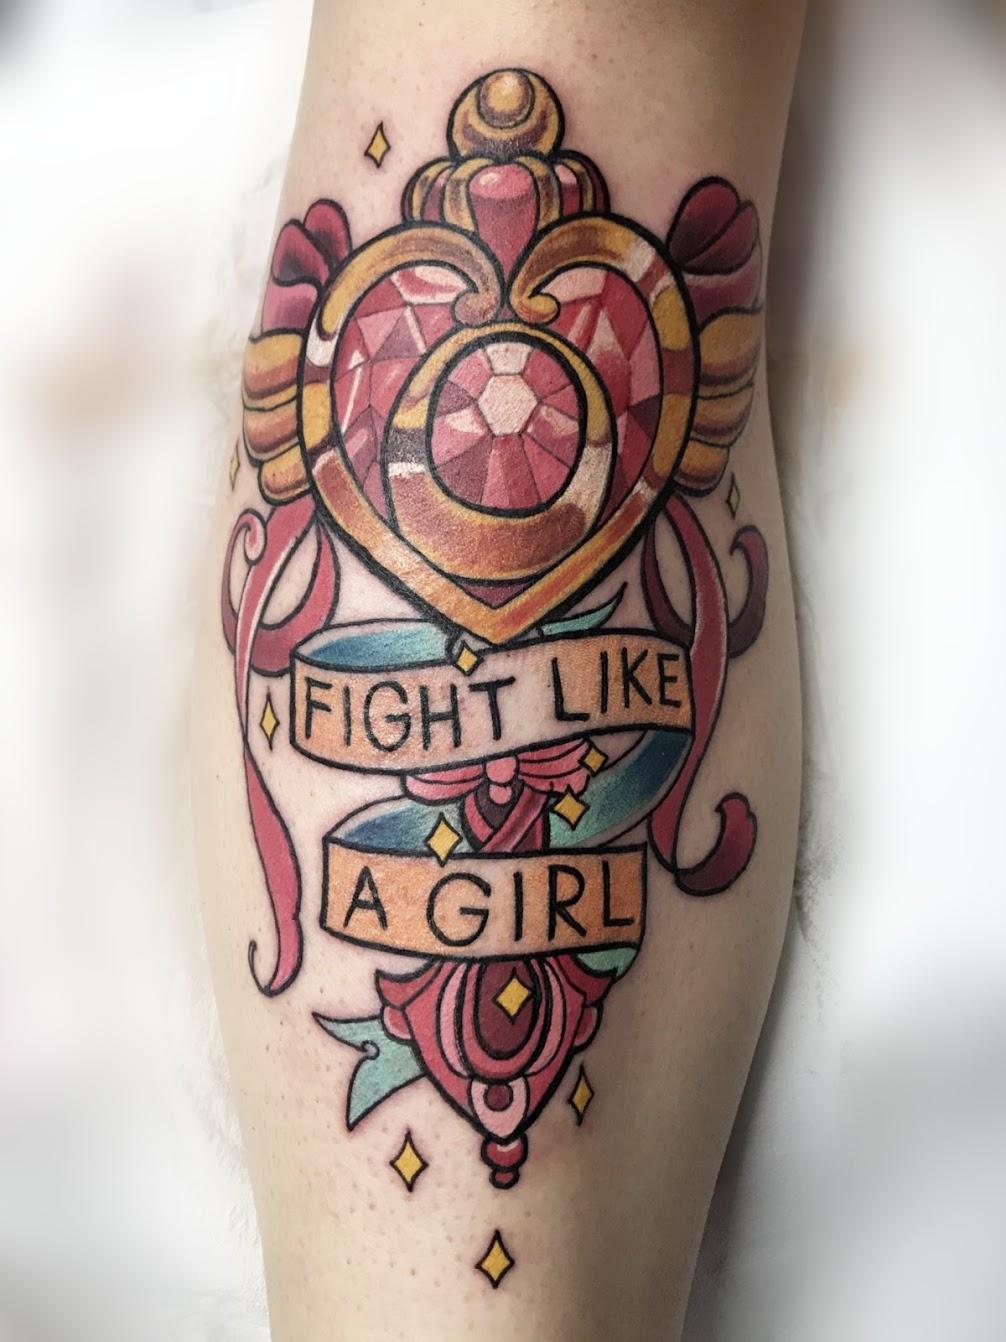 Tattoo-Fight-like-a-girl